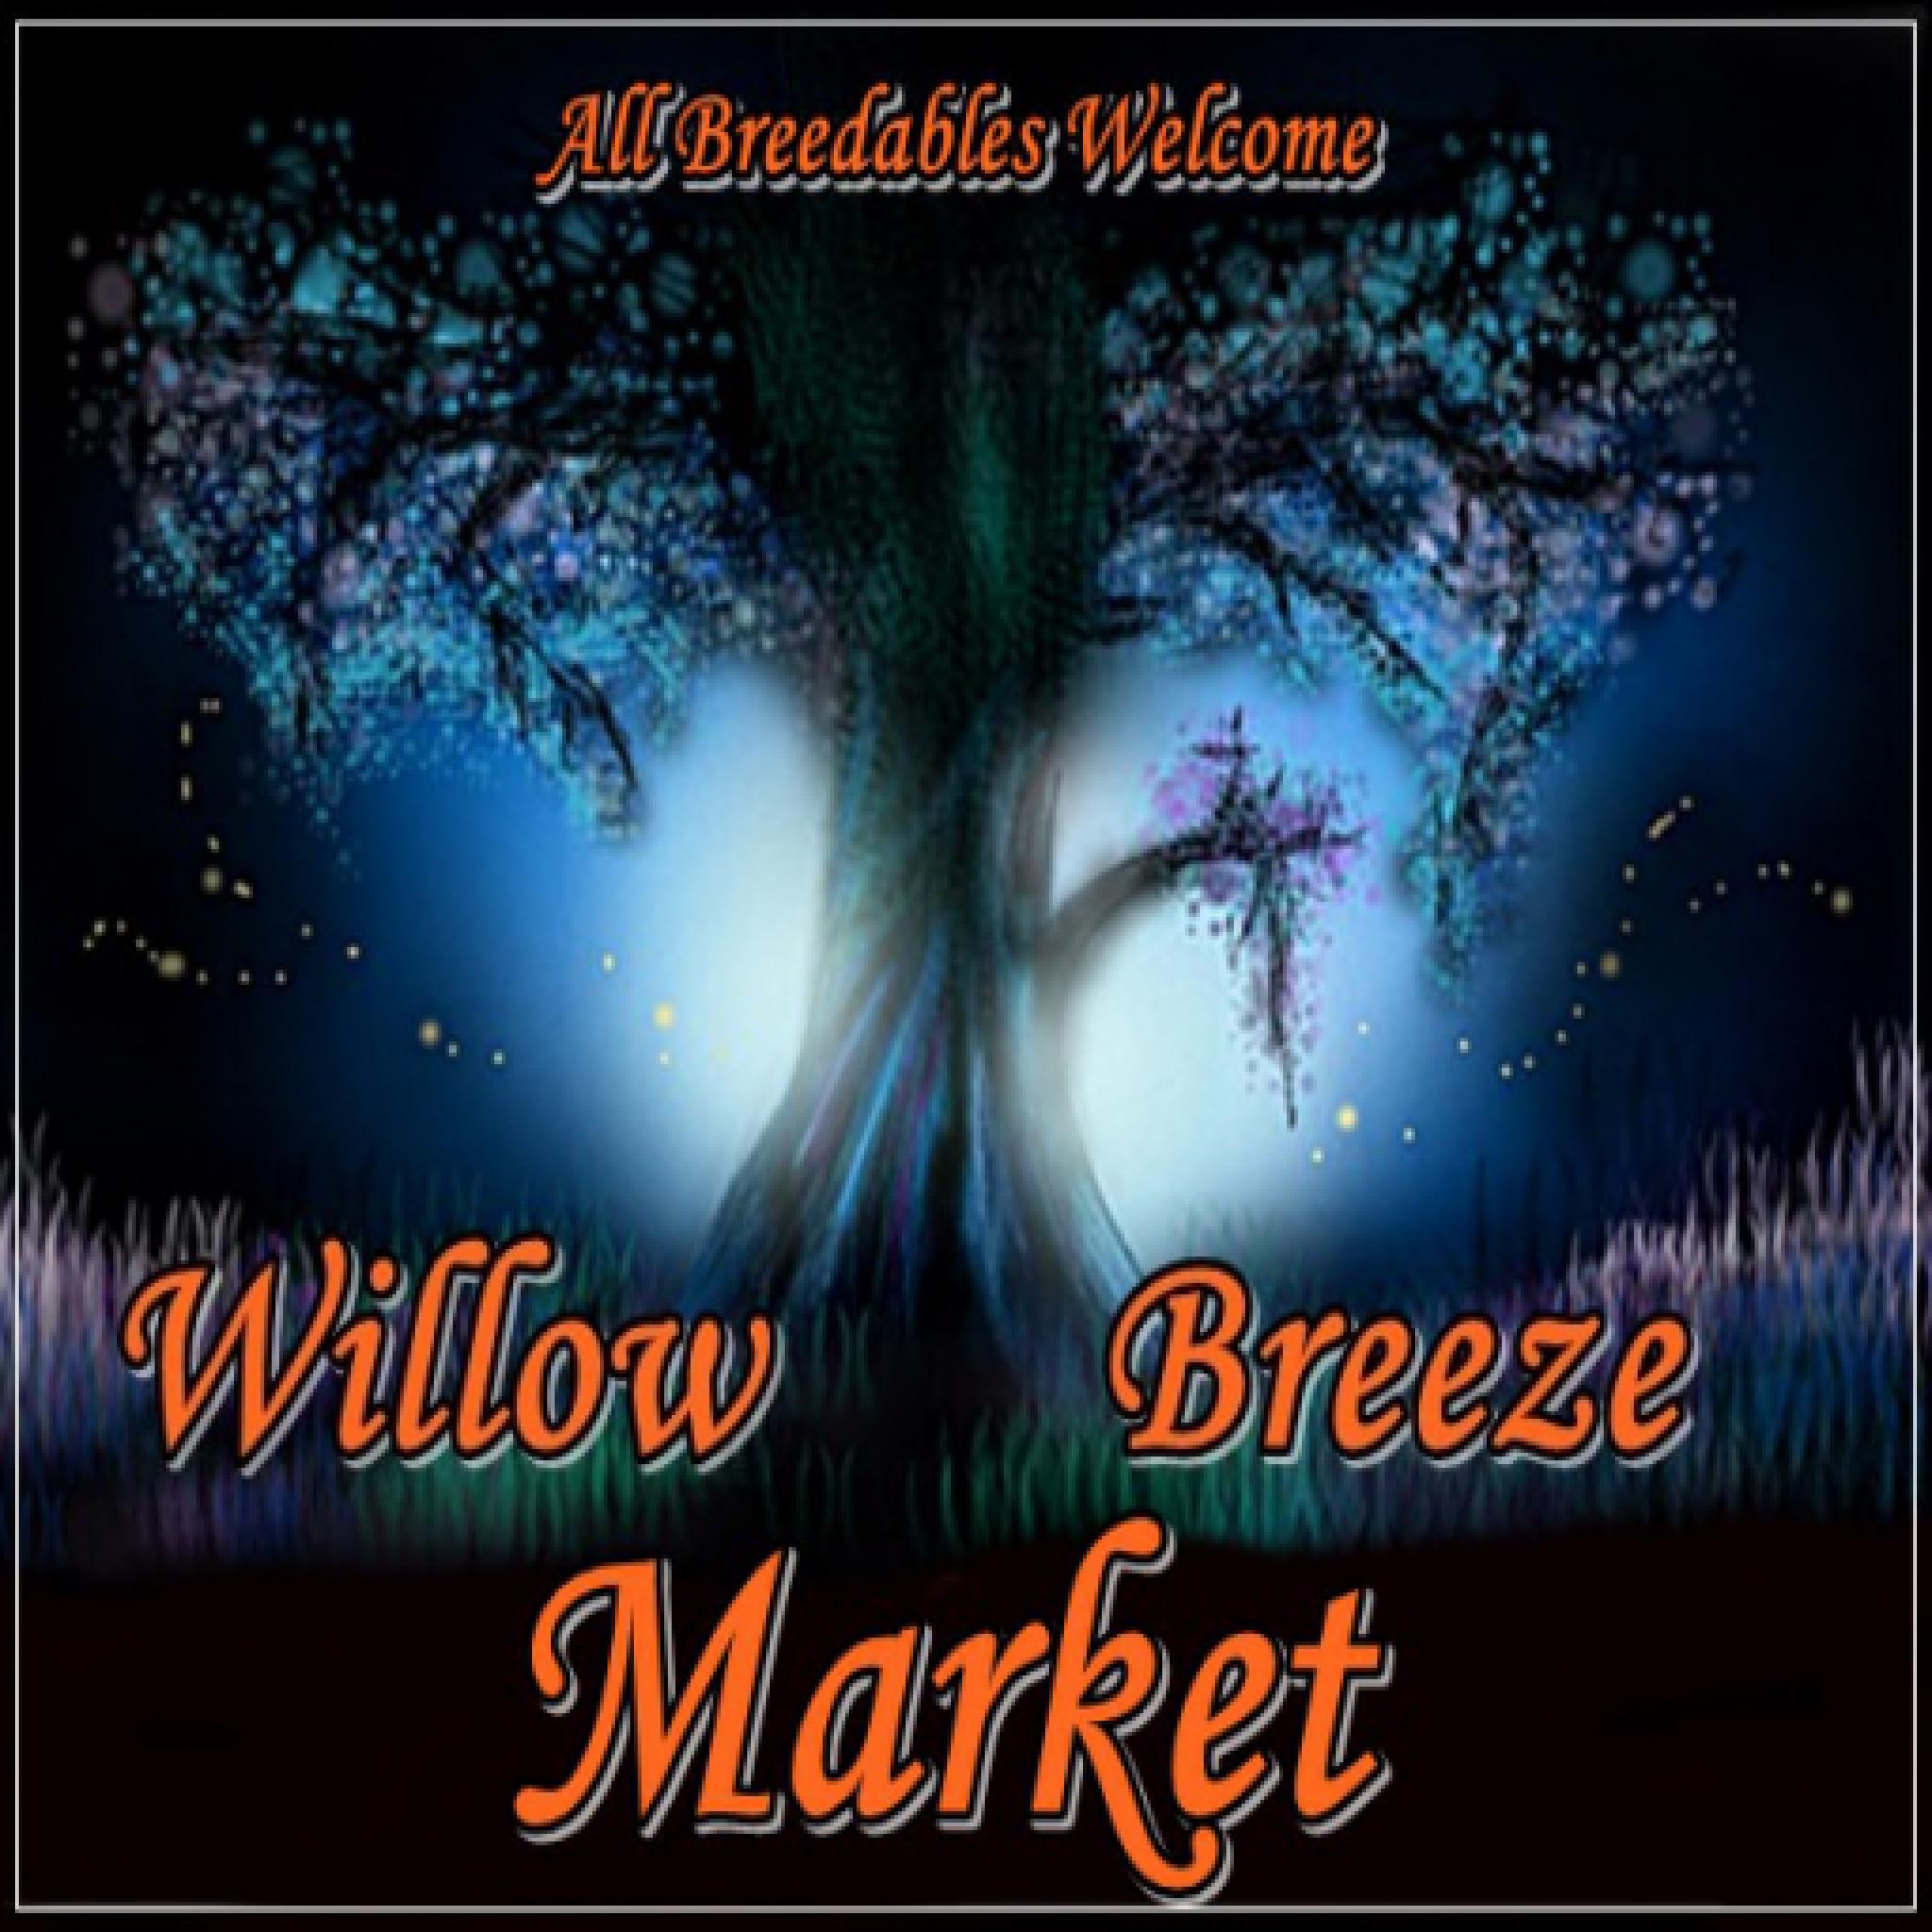 Willow breeze Market all breedables